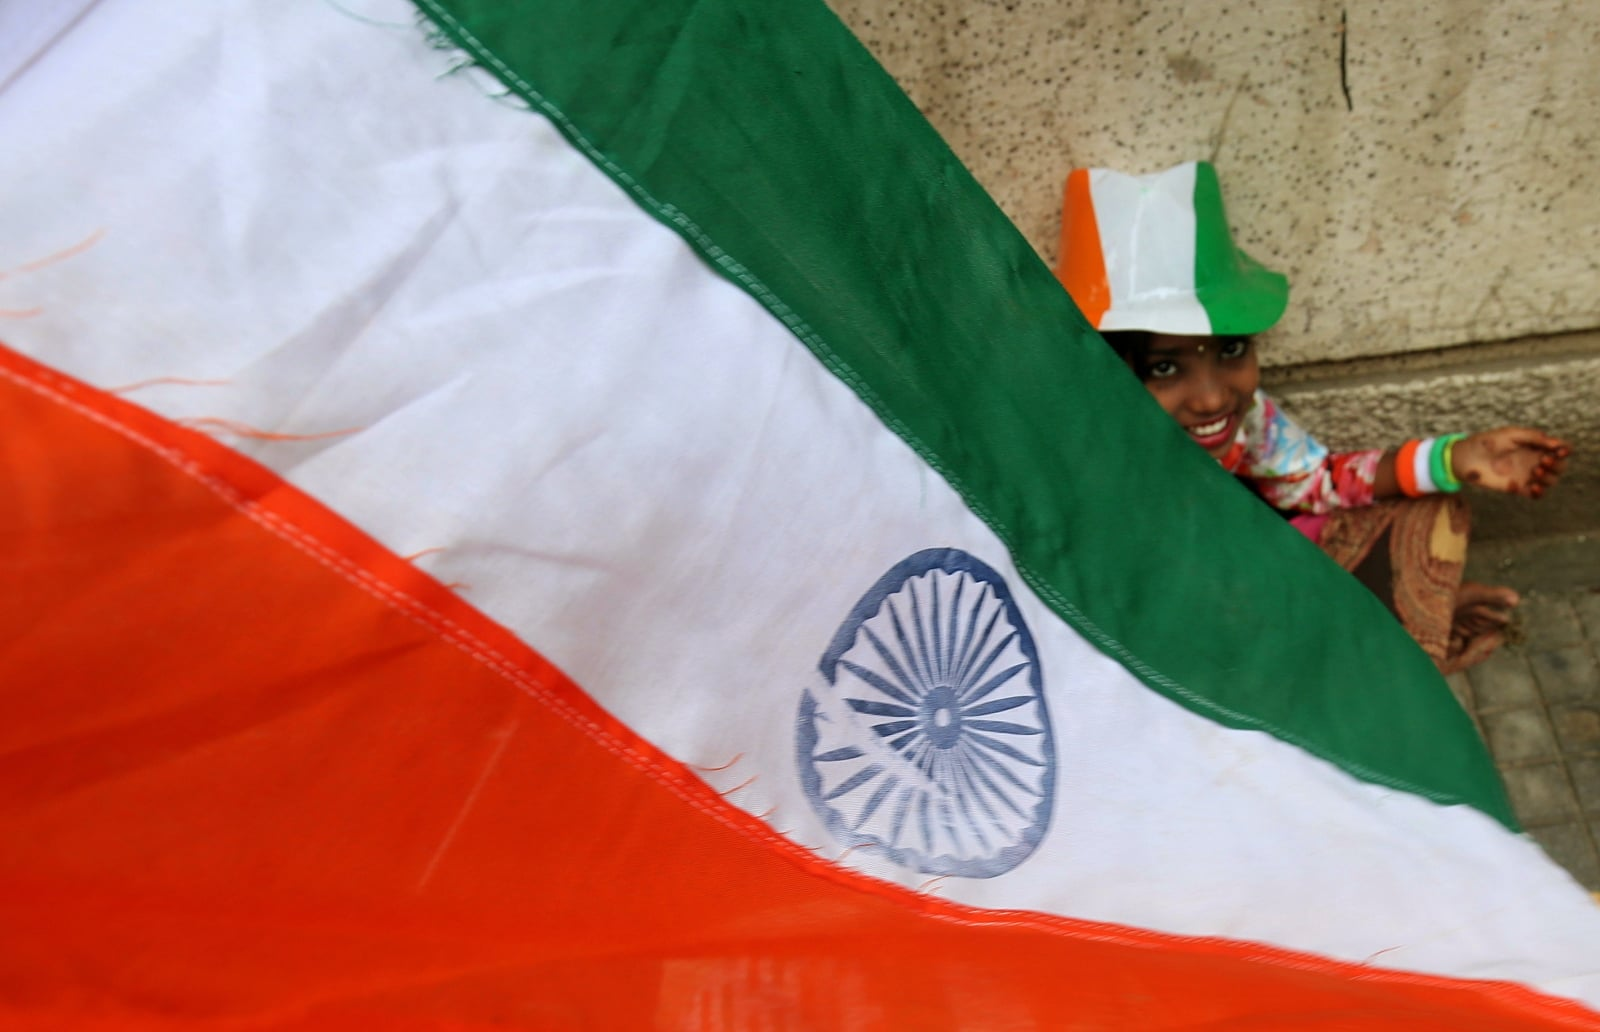 Dzień Niepodległości Indii fot, EPA/JAGADEESH NV